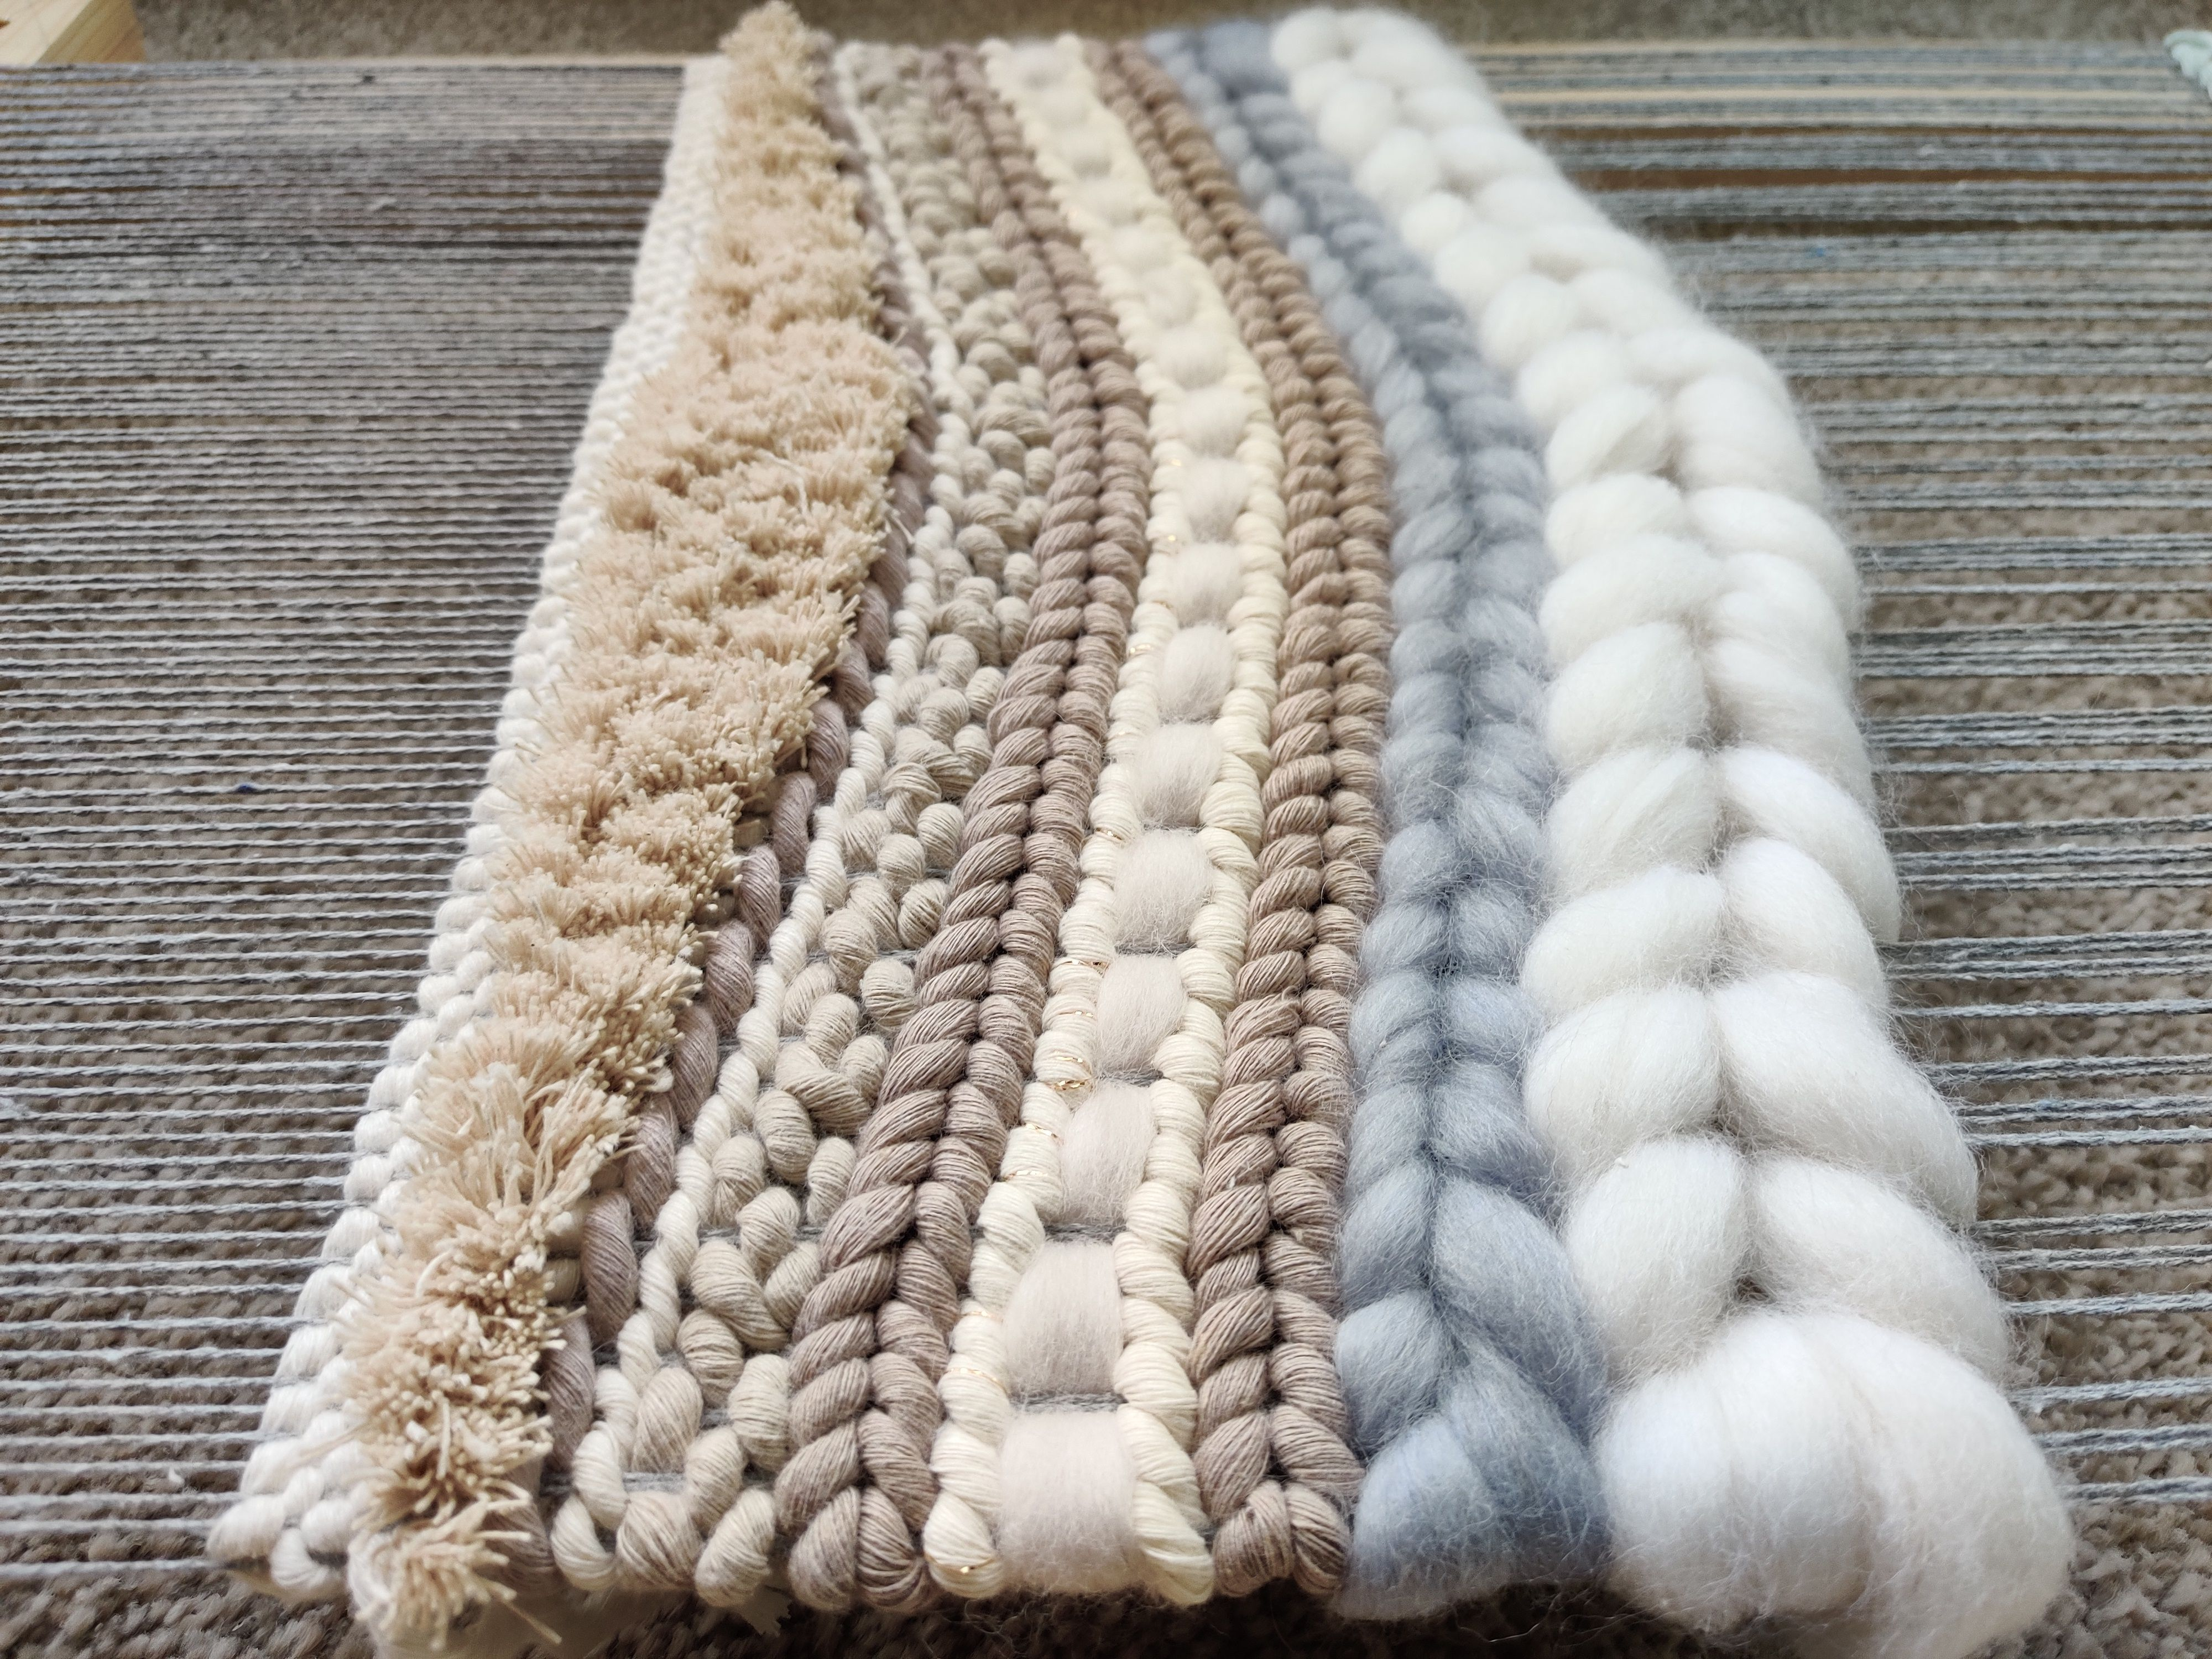 #weaving #weavingart #wip #mordernweaving #weaversofinstagram #weavingart #weavingloom #wovenart #wovenwallhanging #wallhanging #woventextiles #fiberart #fiberartist #cottonstring #modernweaving